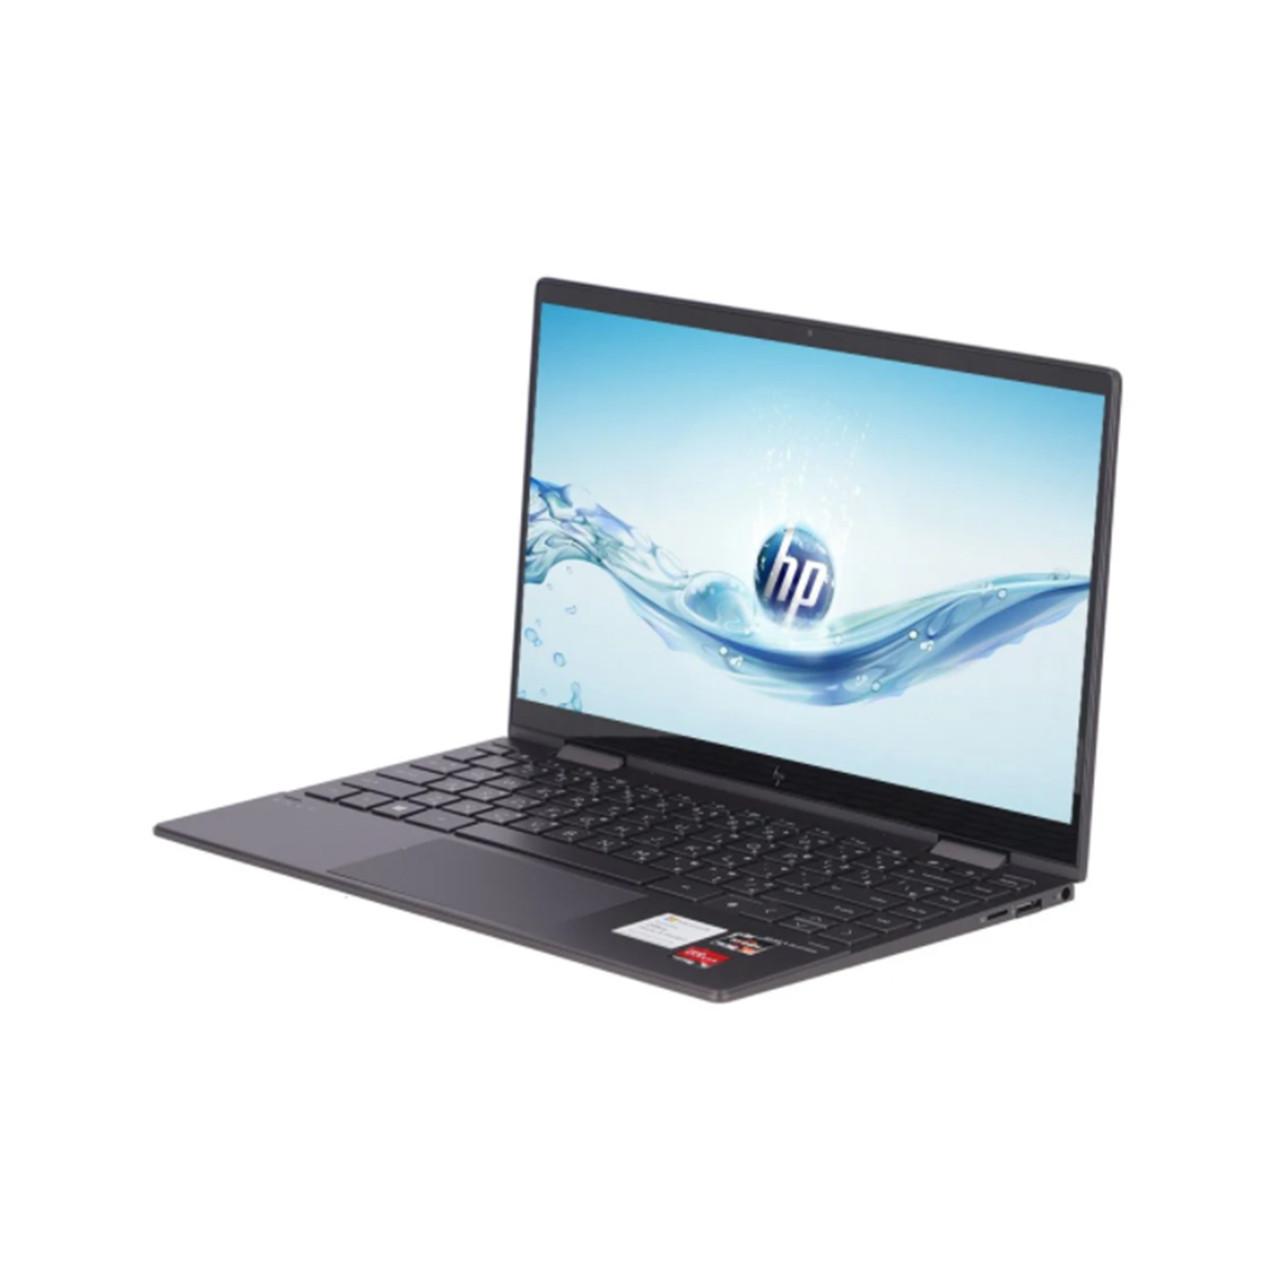 HP ENVY X360 13-AY0001AU